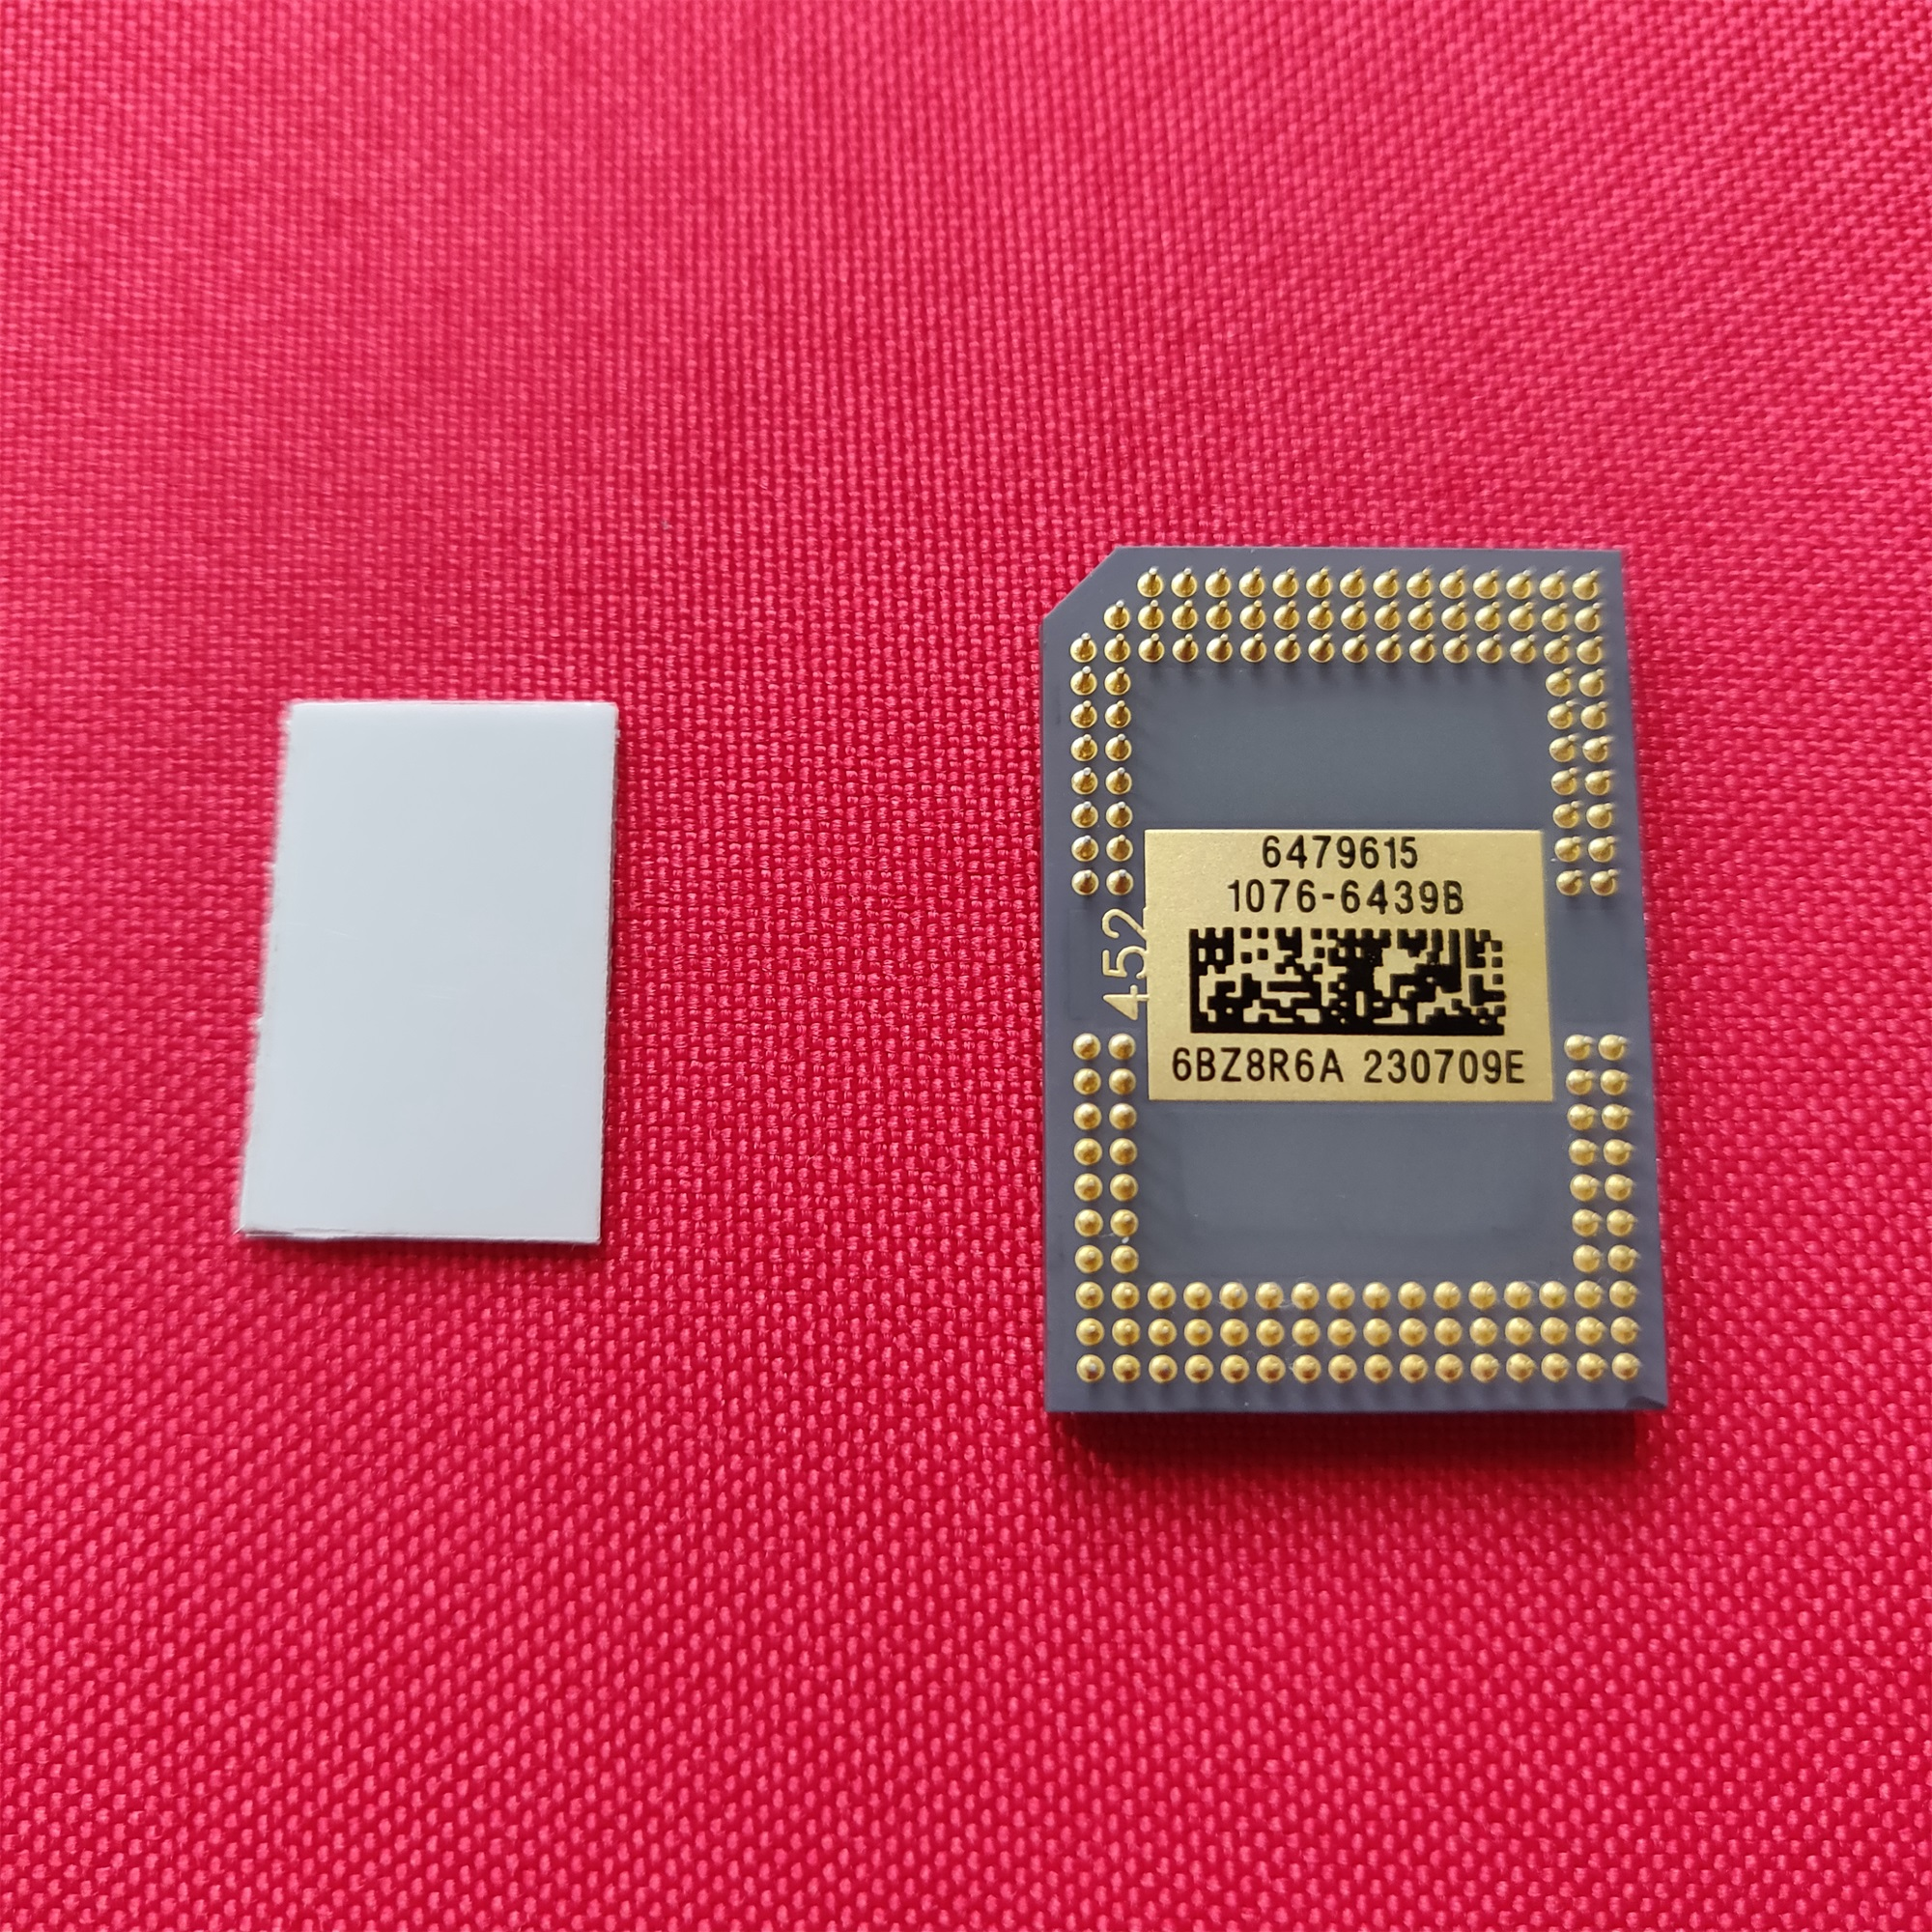 Nouveau projecteur DMD Chip 1076-6038B 1076-6039B 1076-6439B 1076-6438B 1076-601AB 1076-6138B 1076-6139B pour projecteur BenQ NEC SharpNouveau projecteur DMD Chip 1076-6038B 1076-6039B 1076-6439B 1076-6438B 1076-601AB 1076-6138B 1076-6139B pour projecteur BenQ NEC Sharp